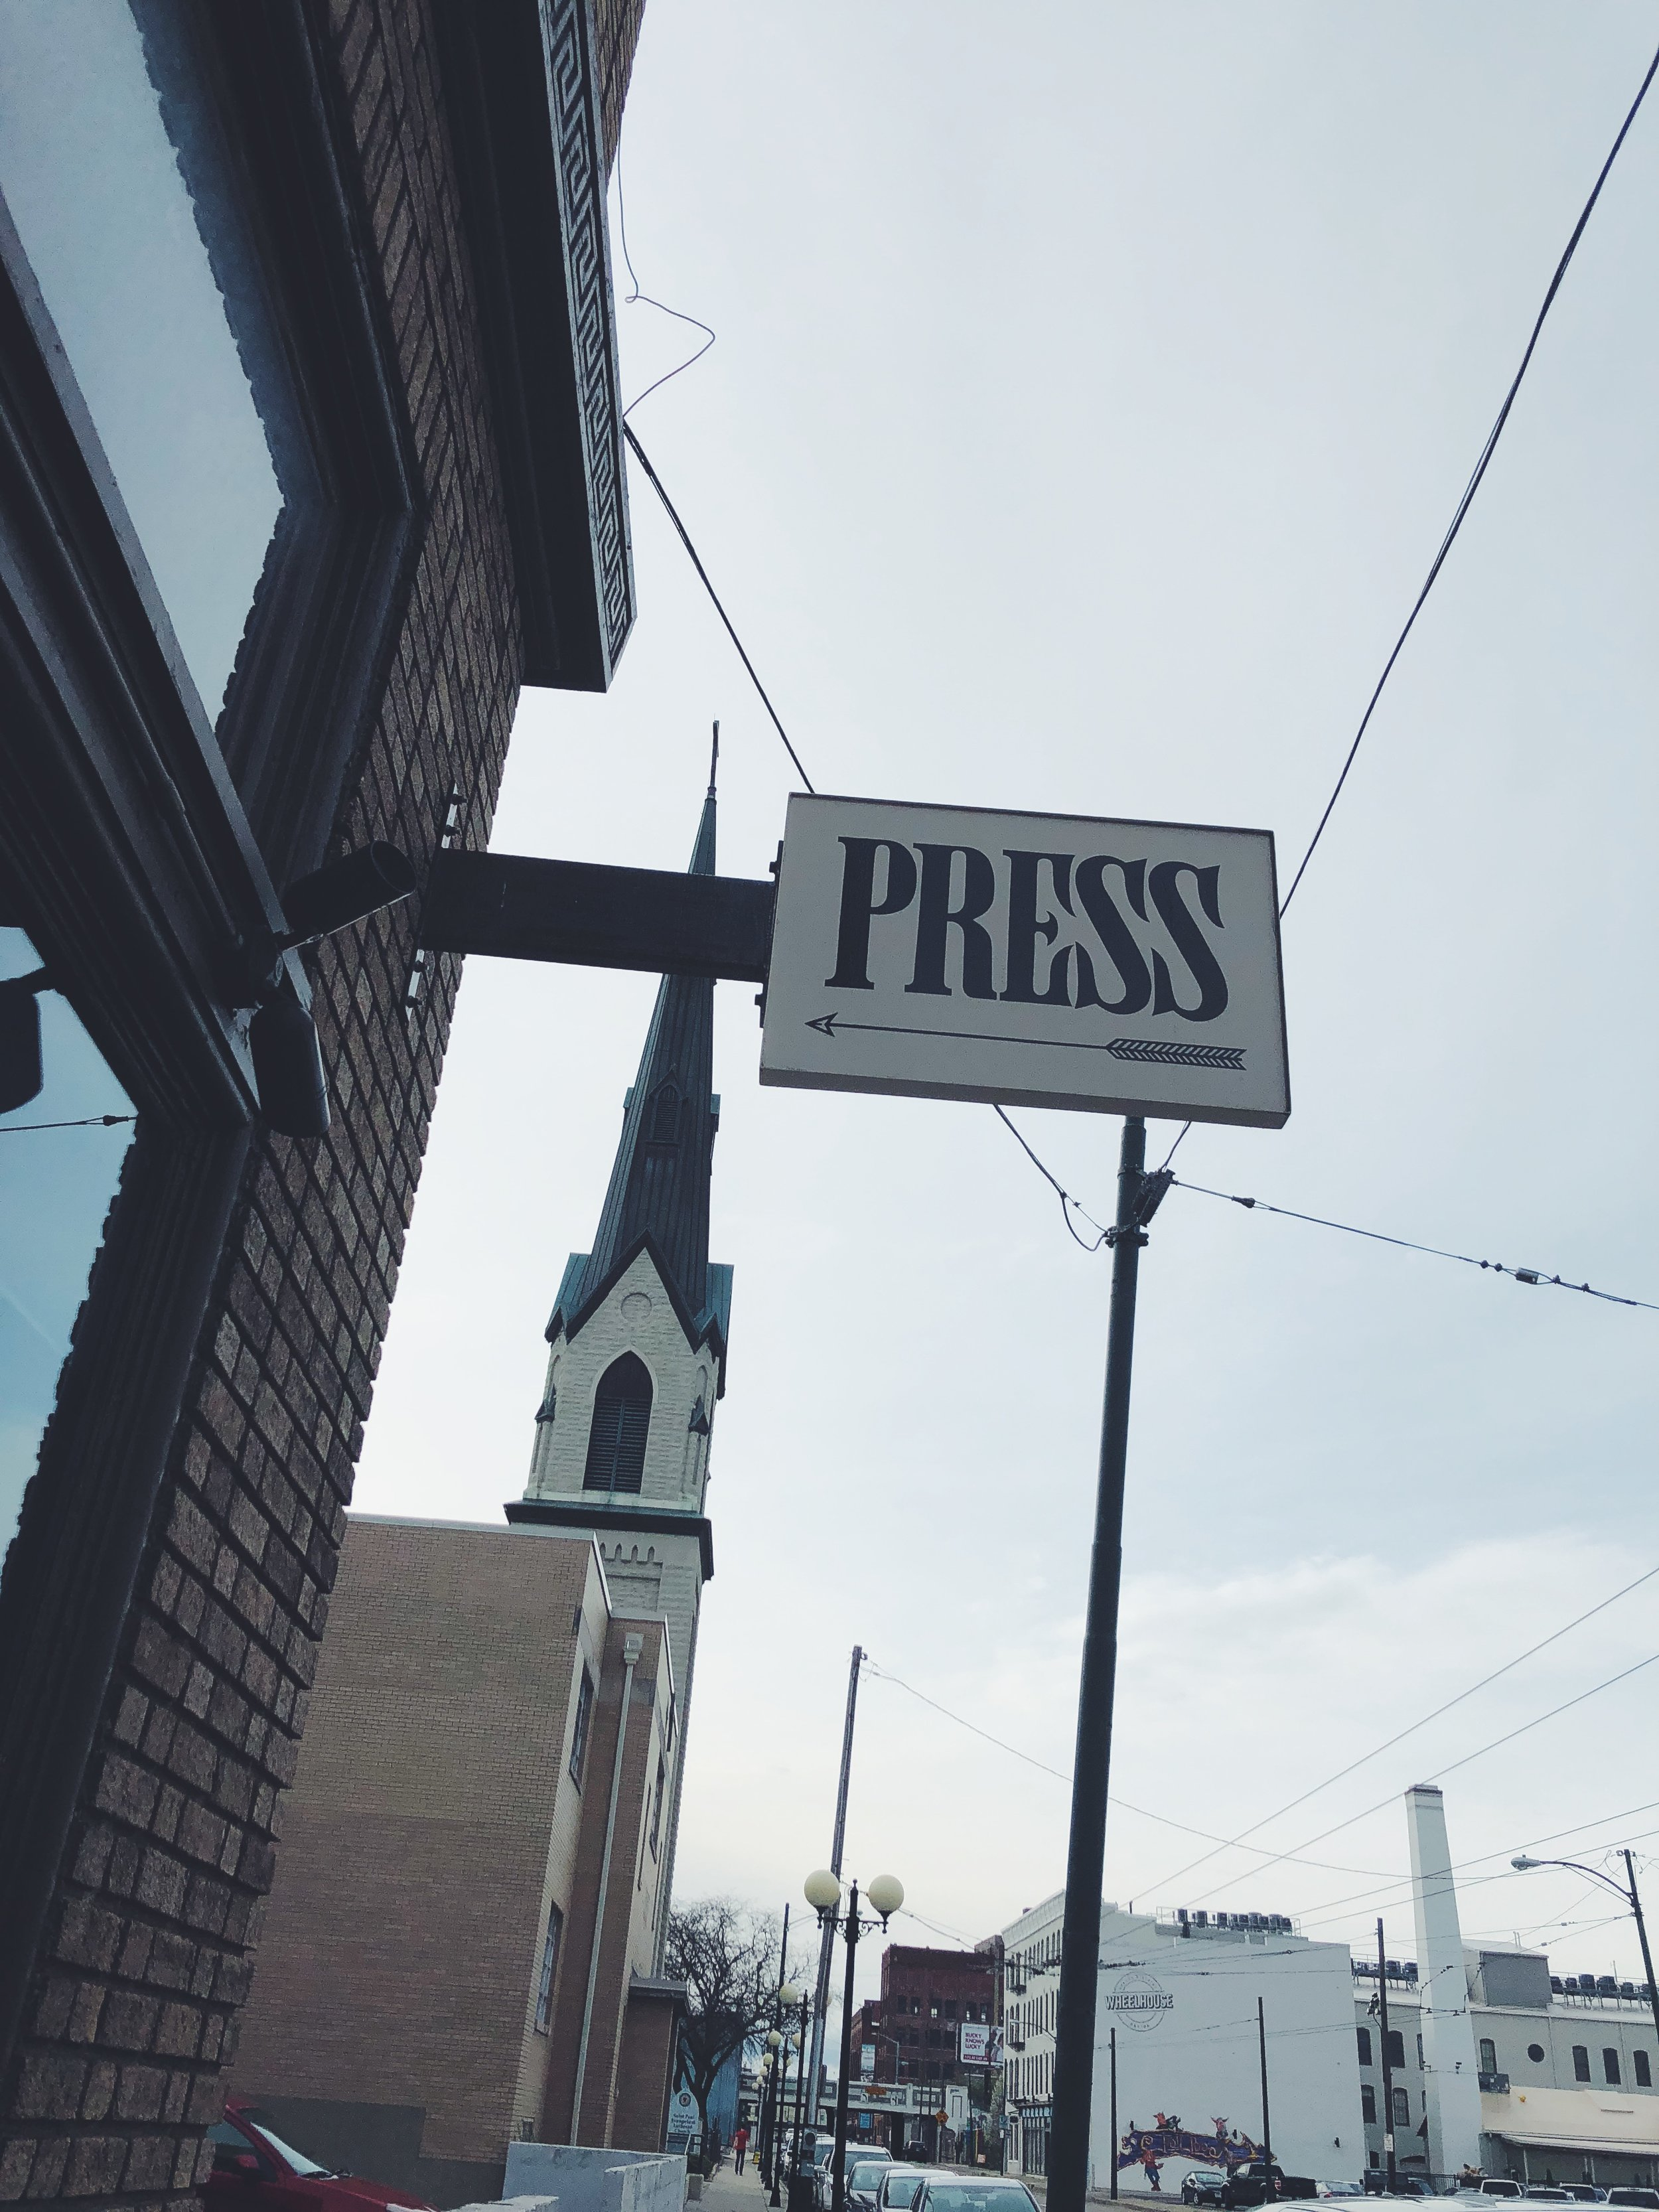 press2.JPG